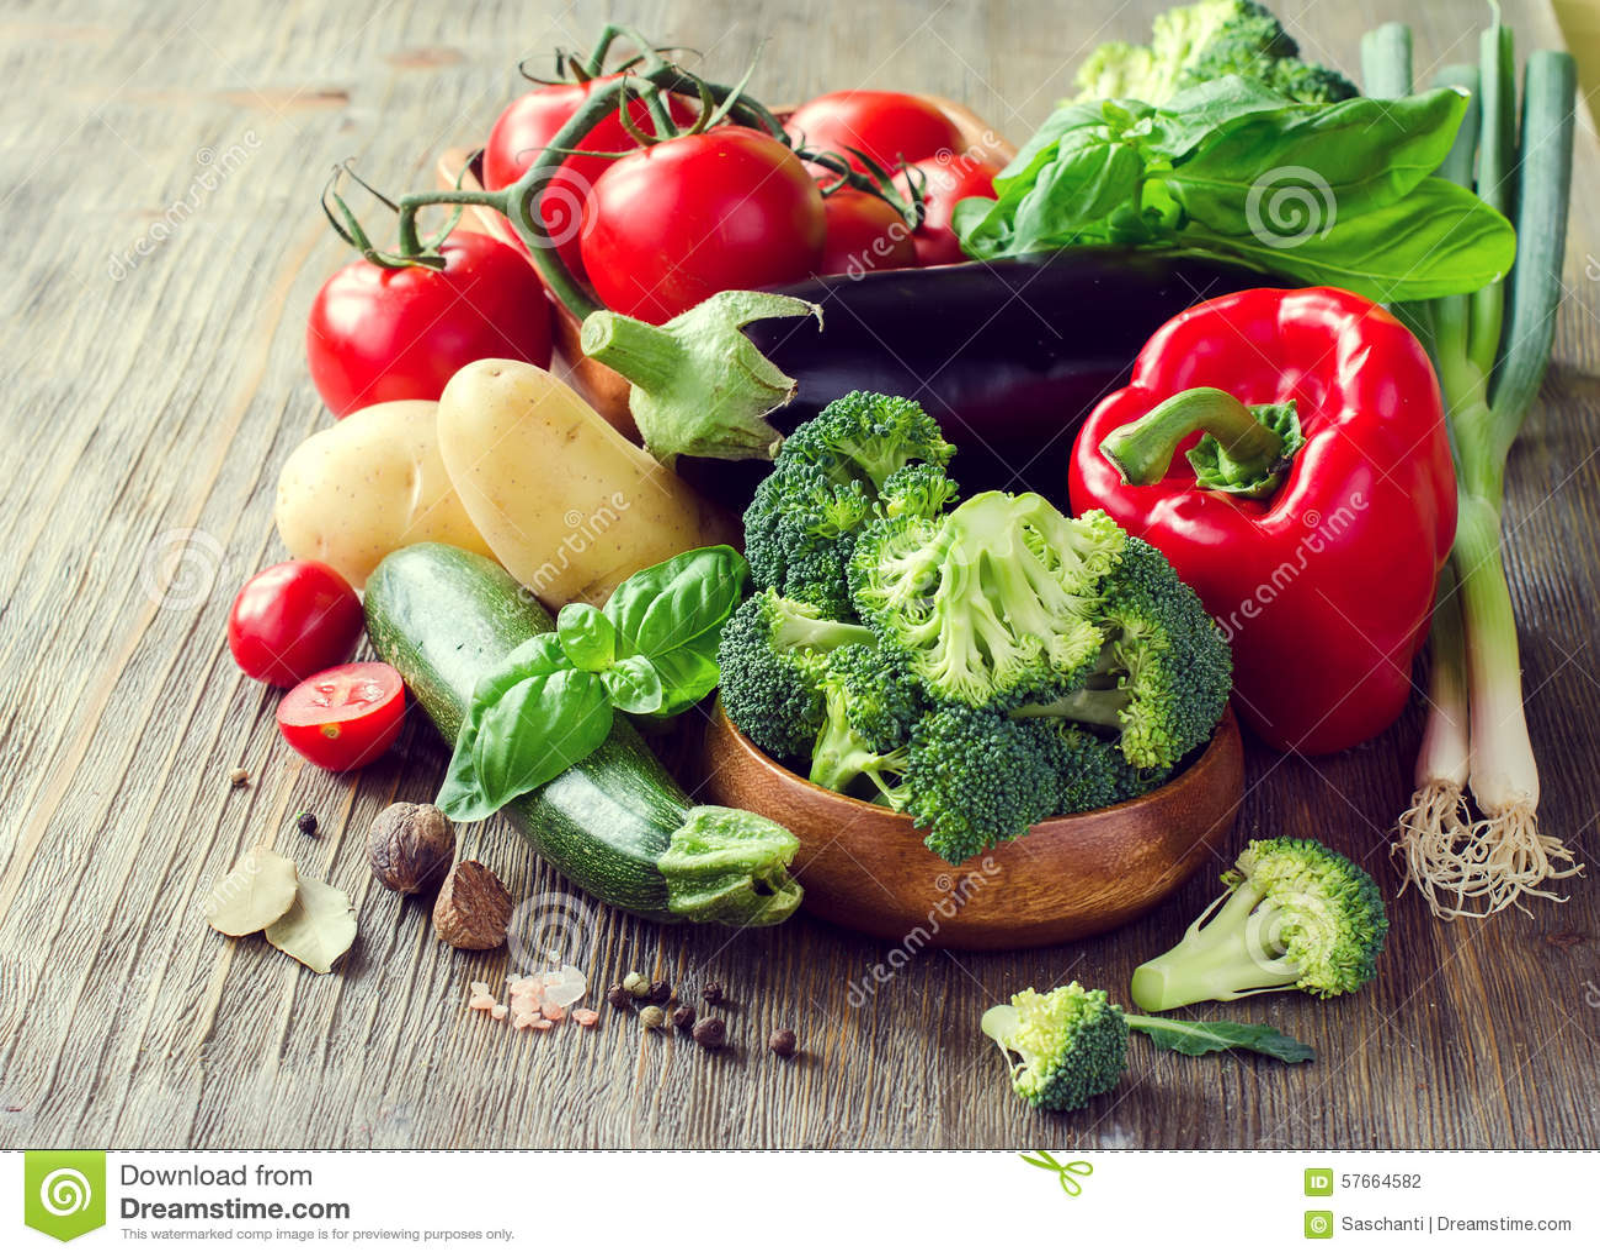 Vegetables for cooking healthy dinner fresh vegetarian for V kitchen restaurant vegetarian food